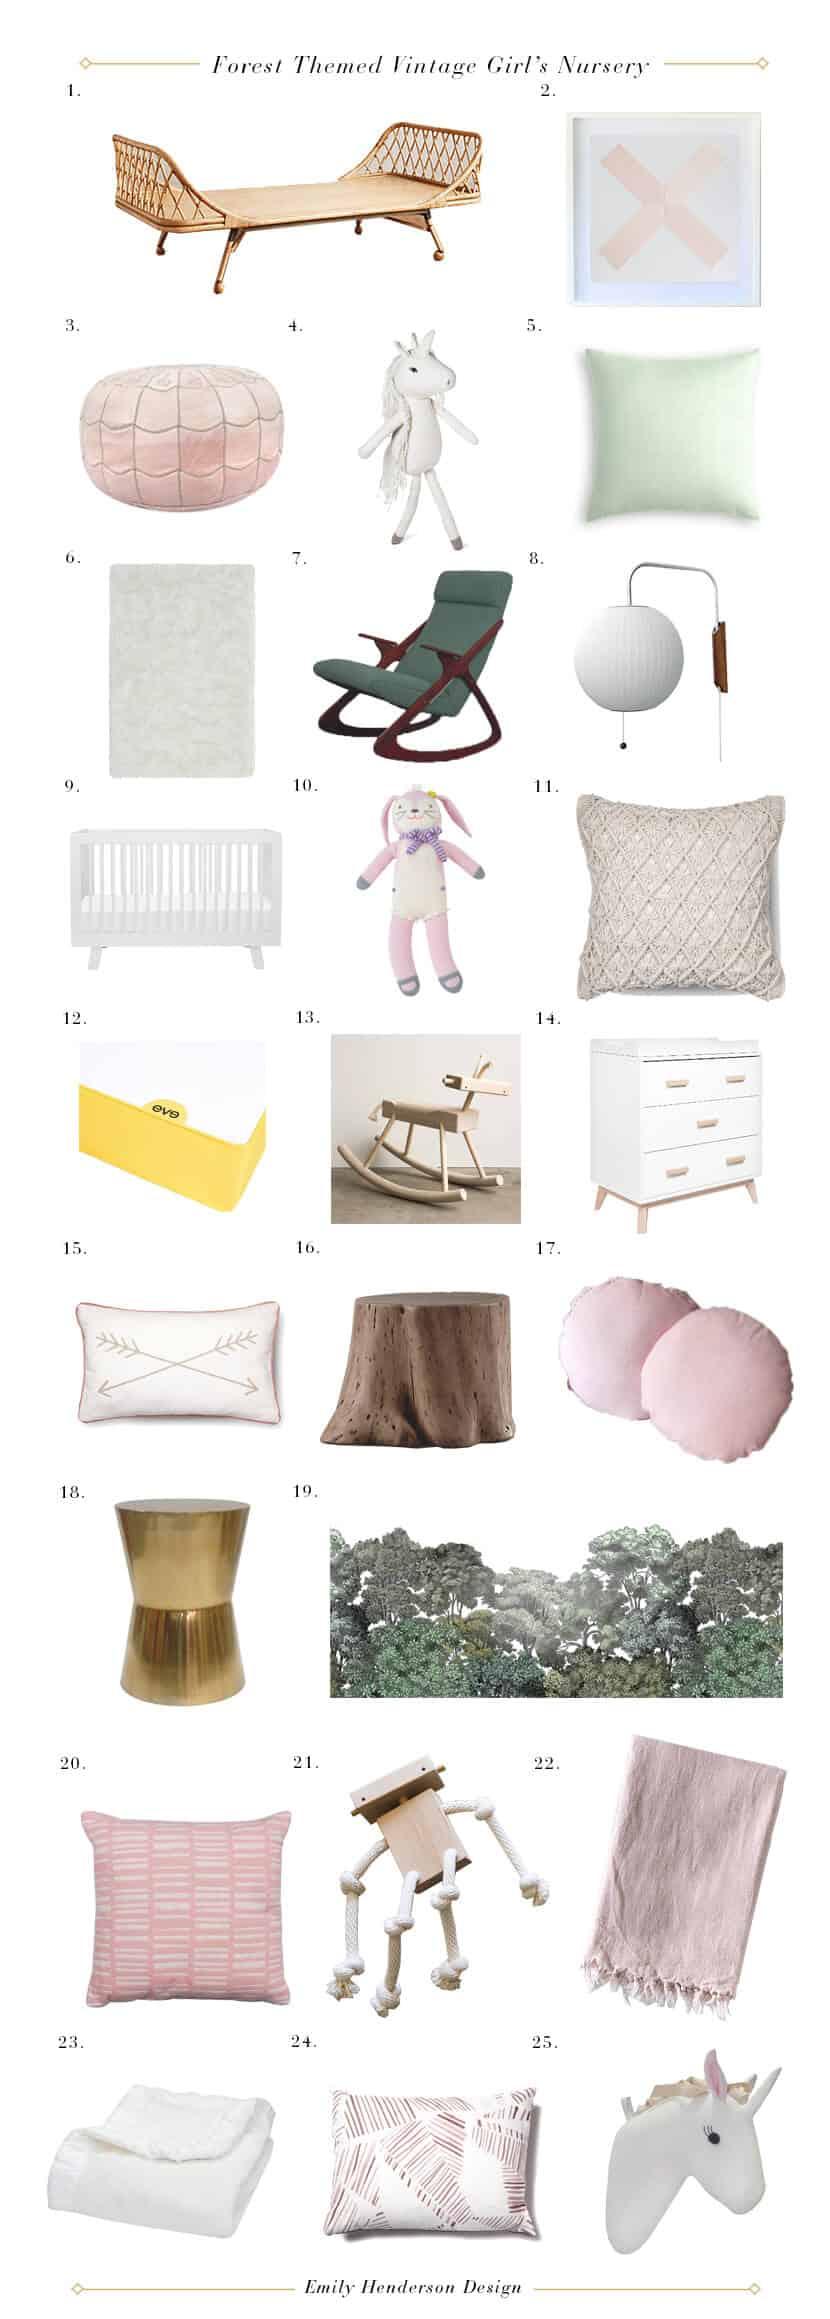 Elliots Nursery Get The Look_pink_green_girls nursery_happy_forest